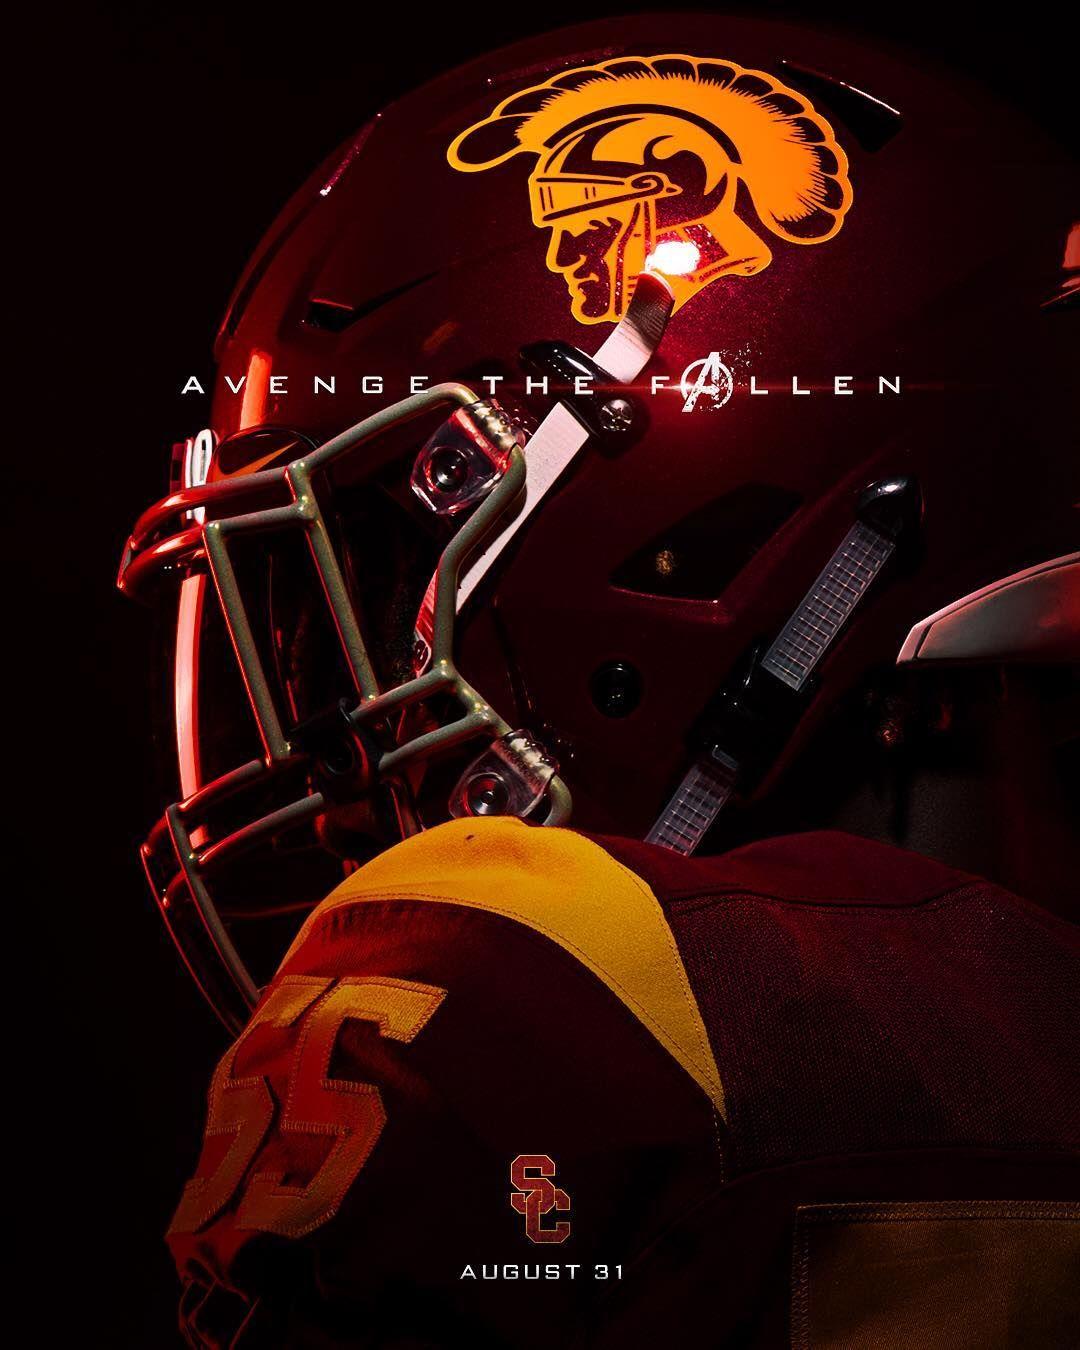 Usc Trojans On Instagram Comeback Season Fighton Usc Trojans Football Usc Football Usc Trojans